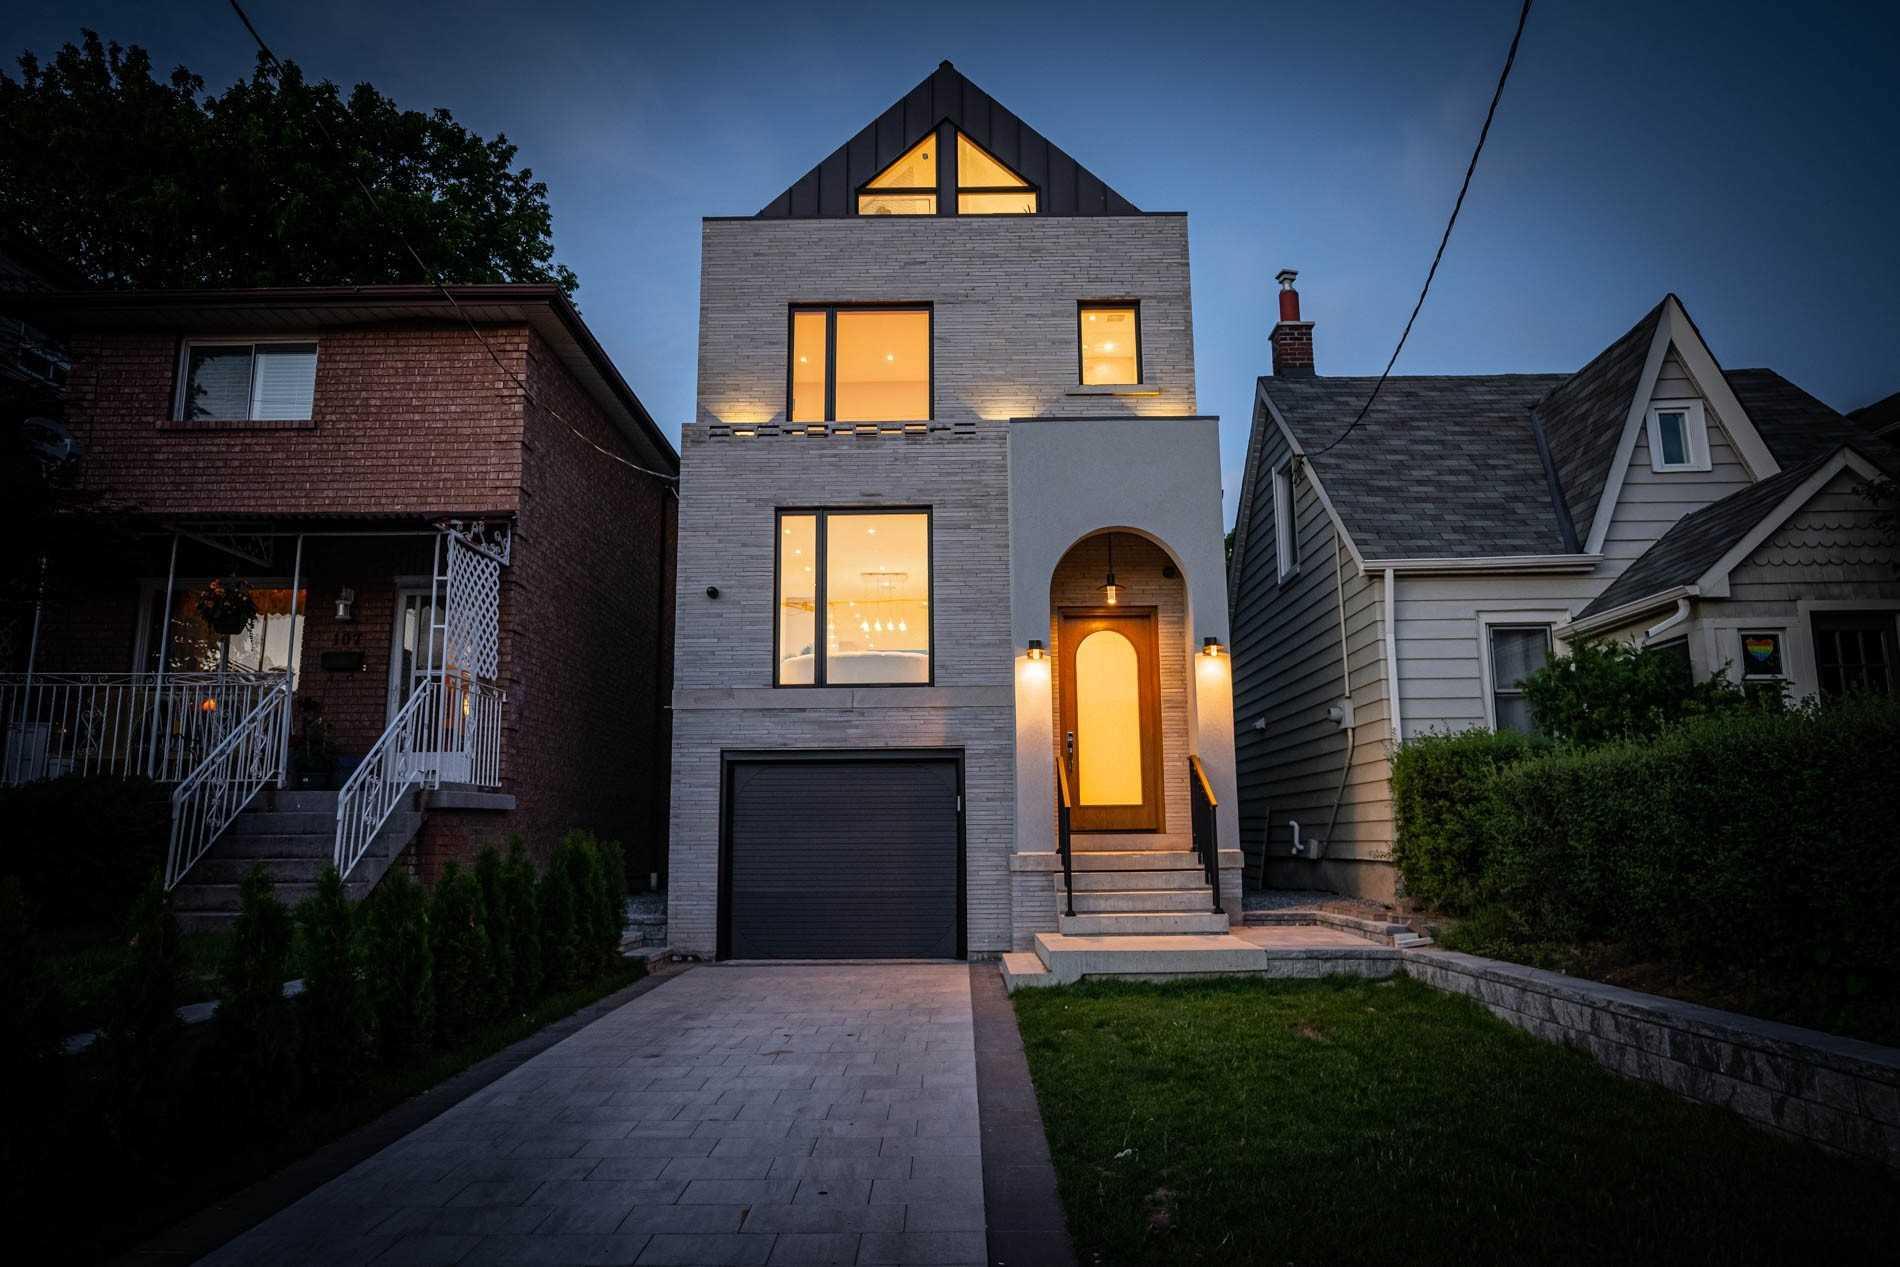 103 Priscilla Ave, Toronto, Ontario M6S3W4, 4 Bedrooms Bedrooms, 8 Rooms Rooms,6 BathroomsBathrooms,Detached,For Sale,Priscilla,W5309744